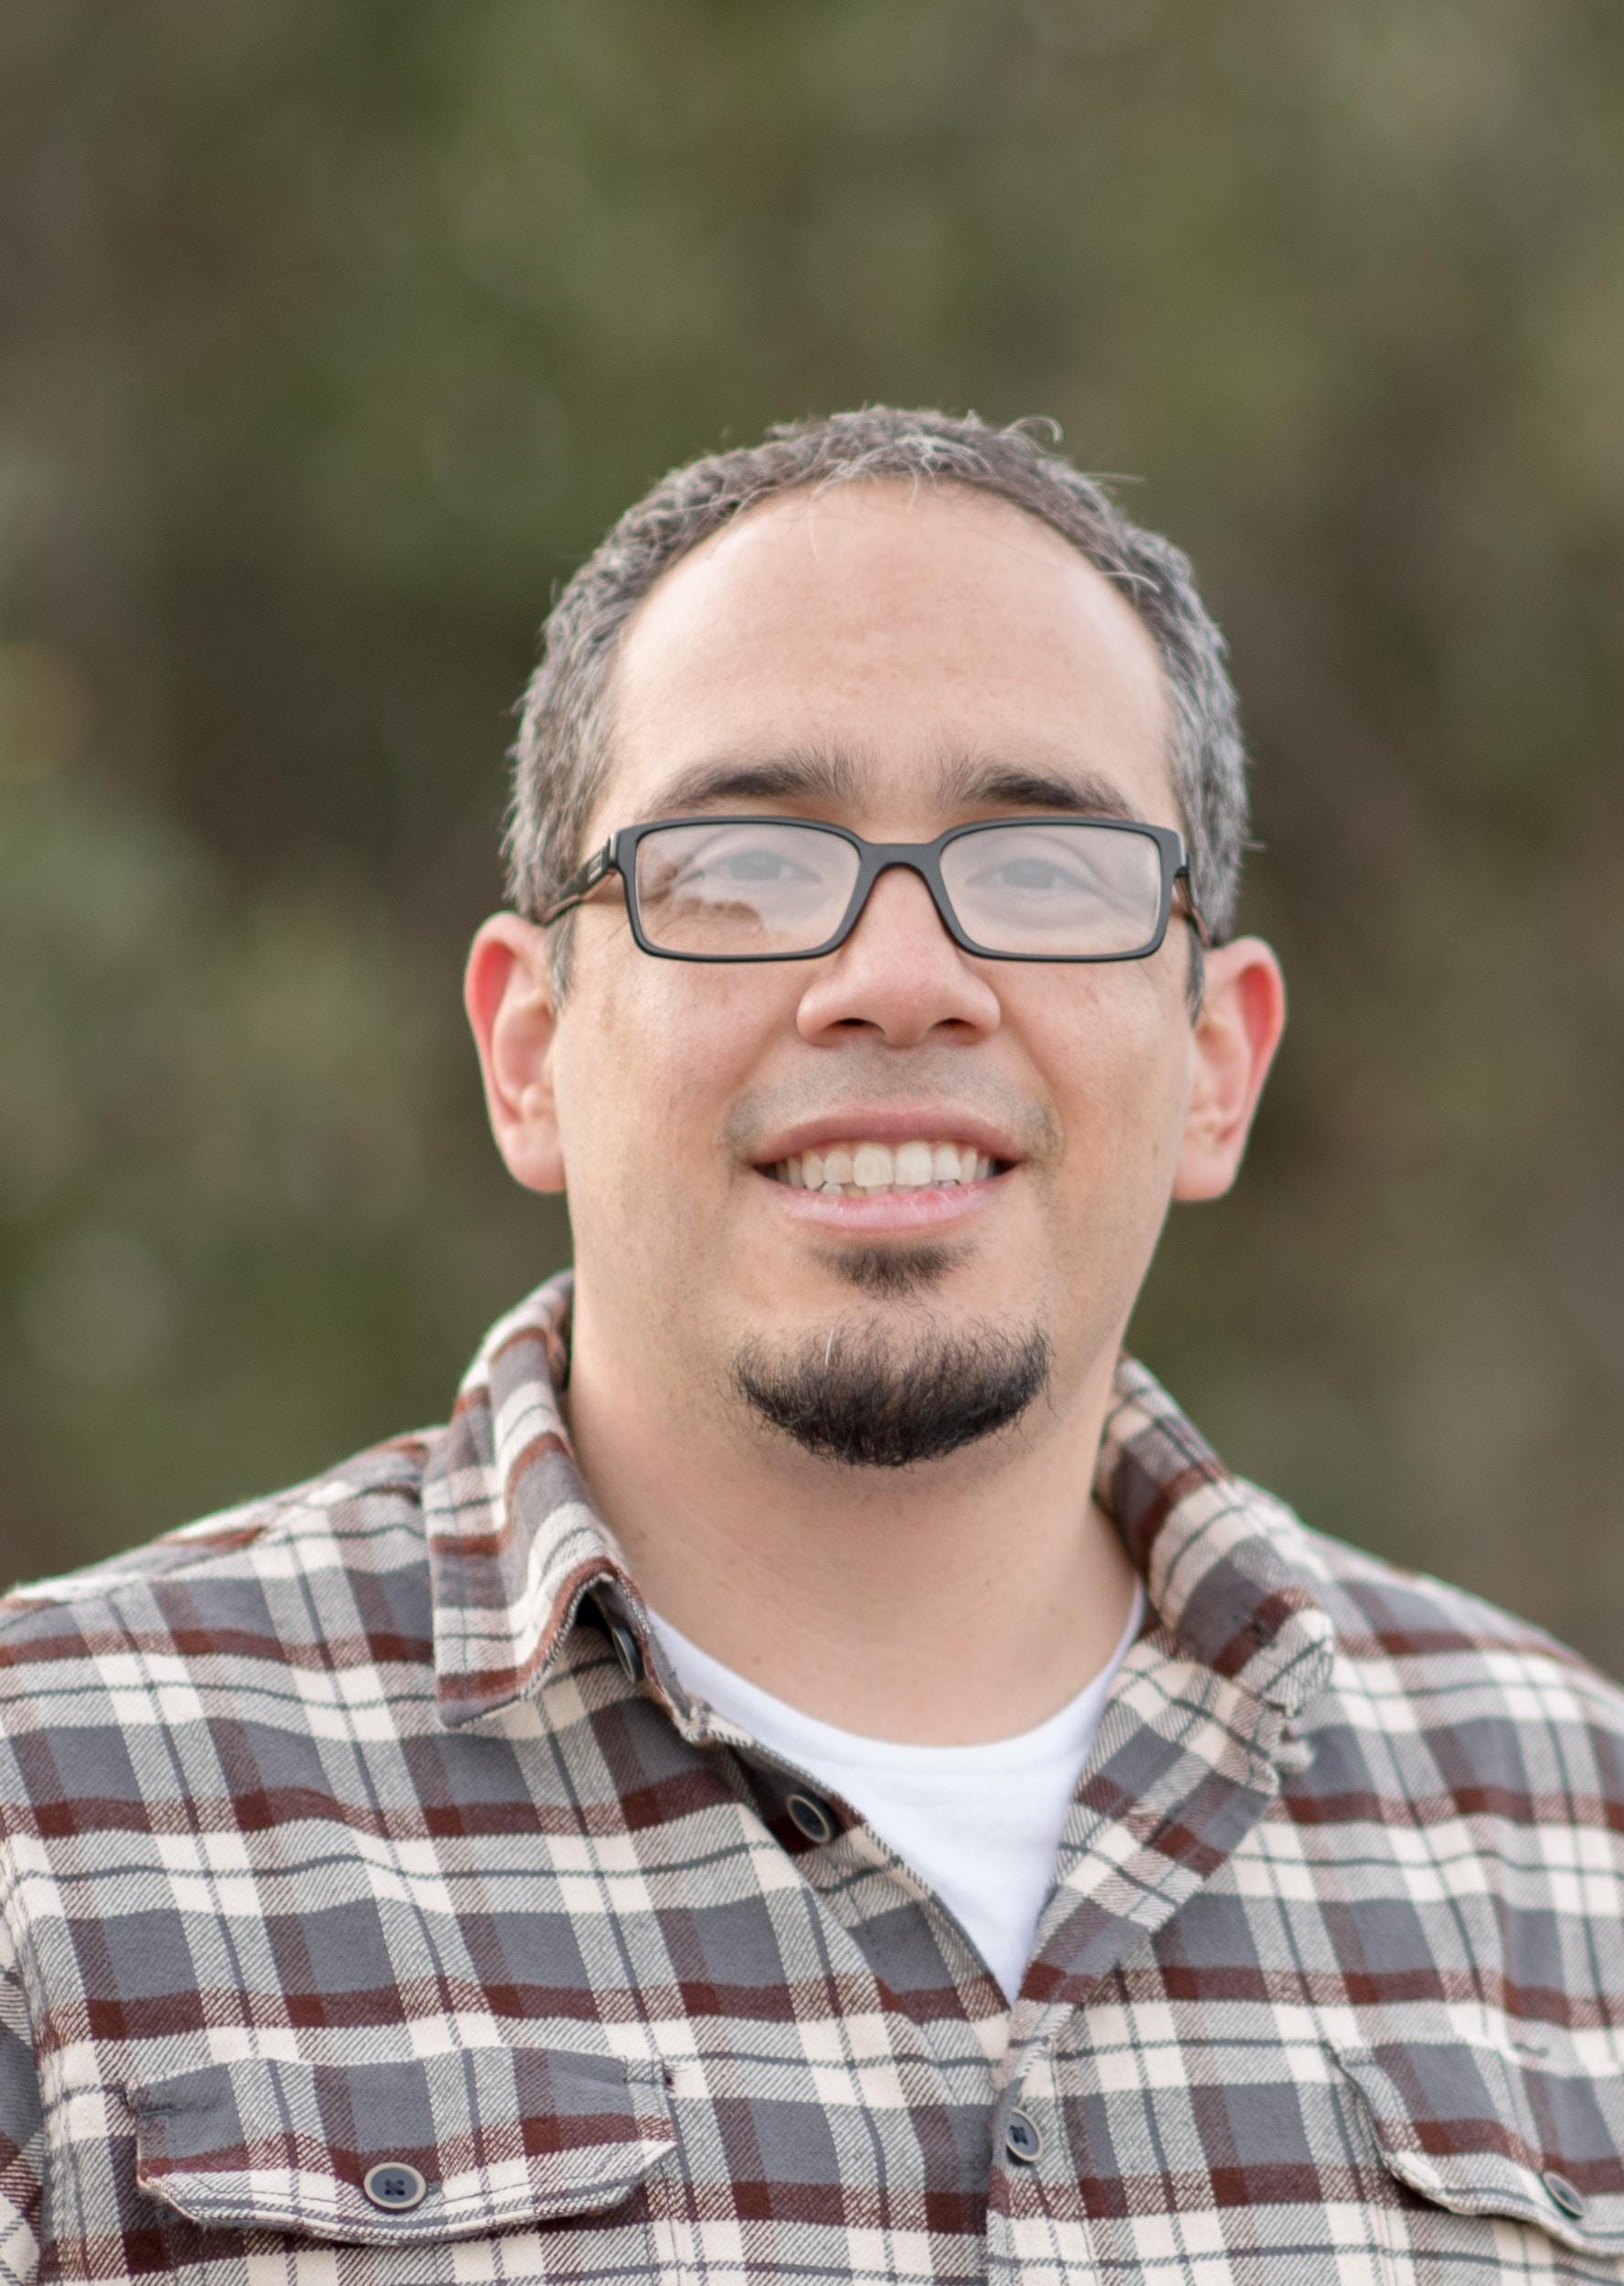 Go to Gerardo Ramirez's profile